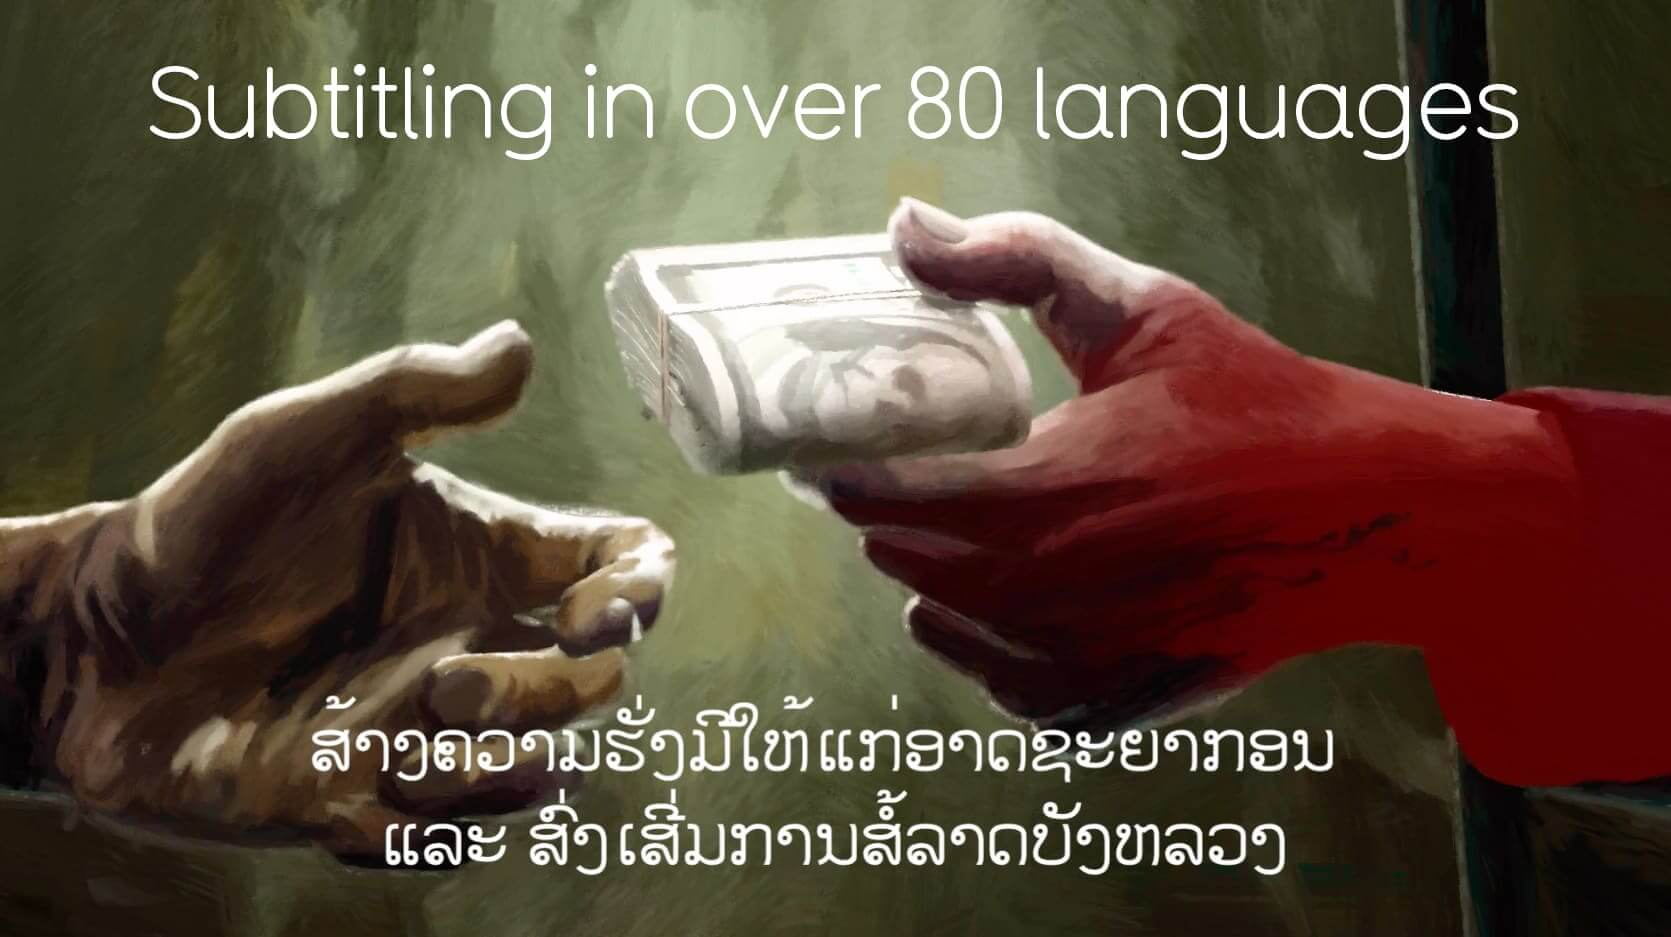 Subtitling services